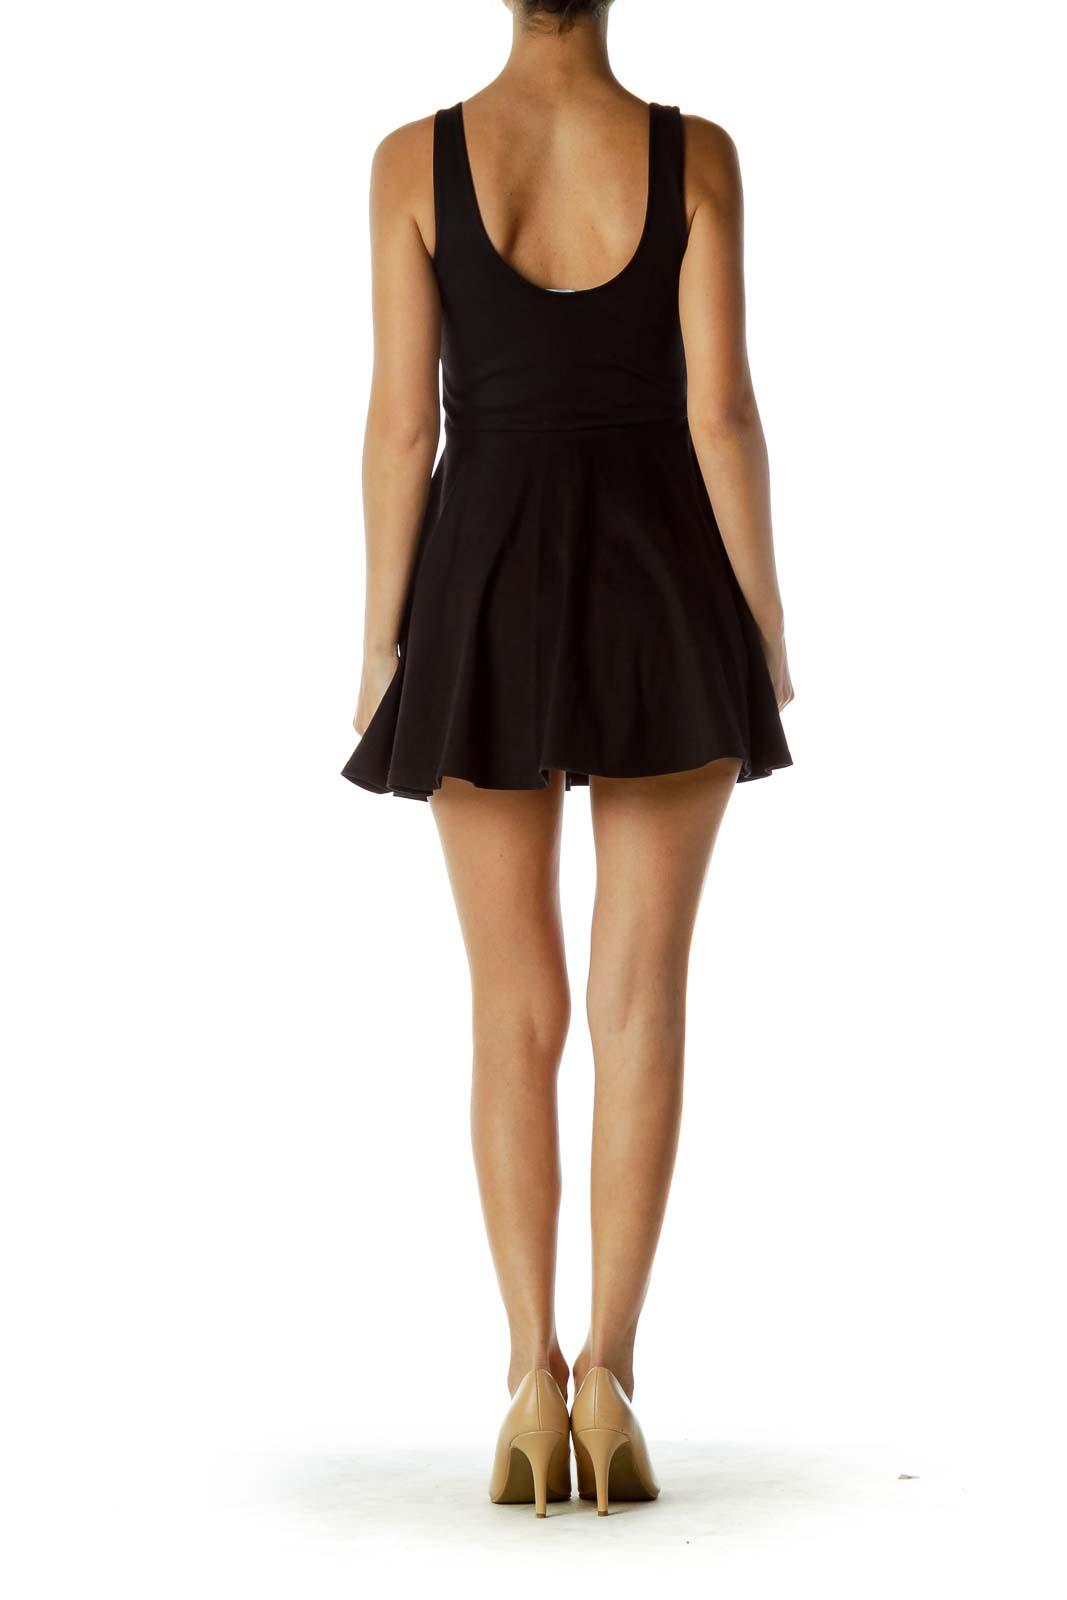 Black Sweetheart Neckline Romper Dress